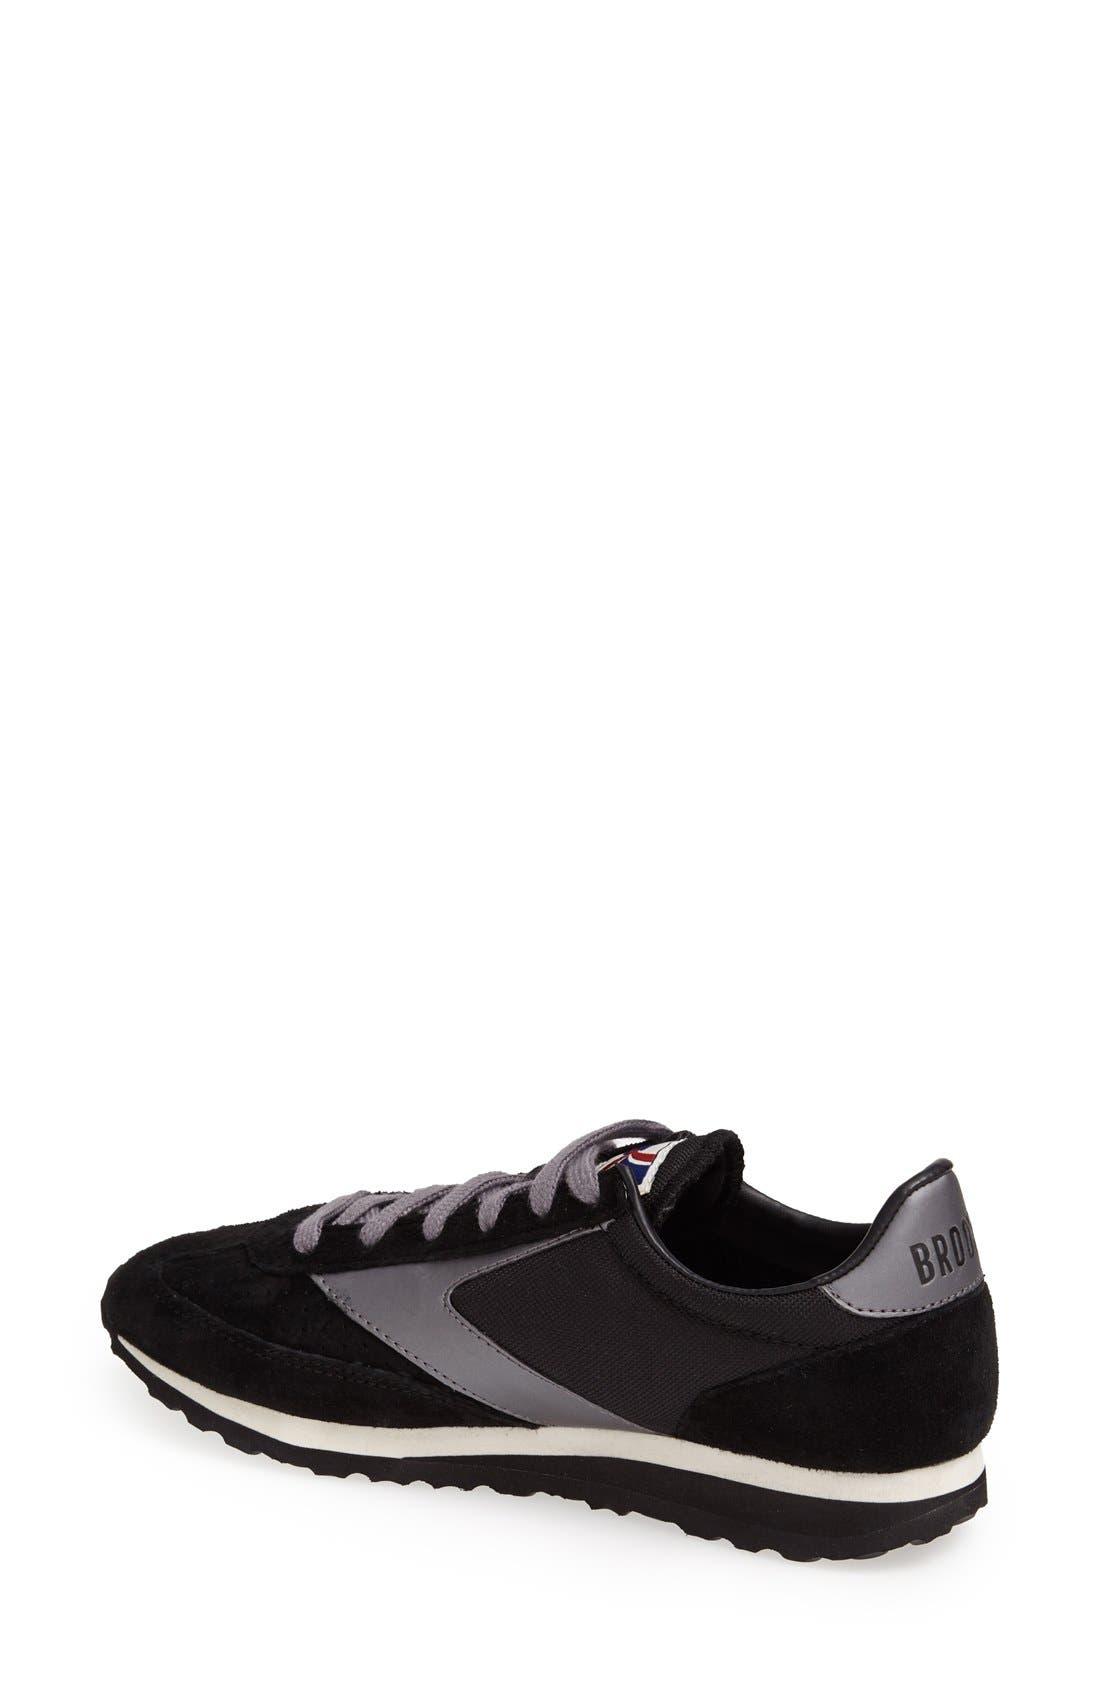 'Vanguard' Sneaker,                             Alternate thumbnail 110, color,